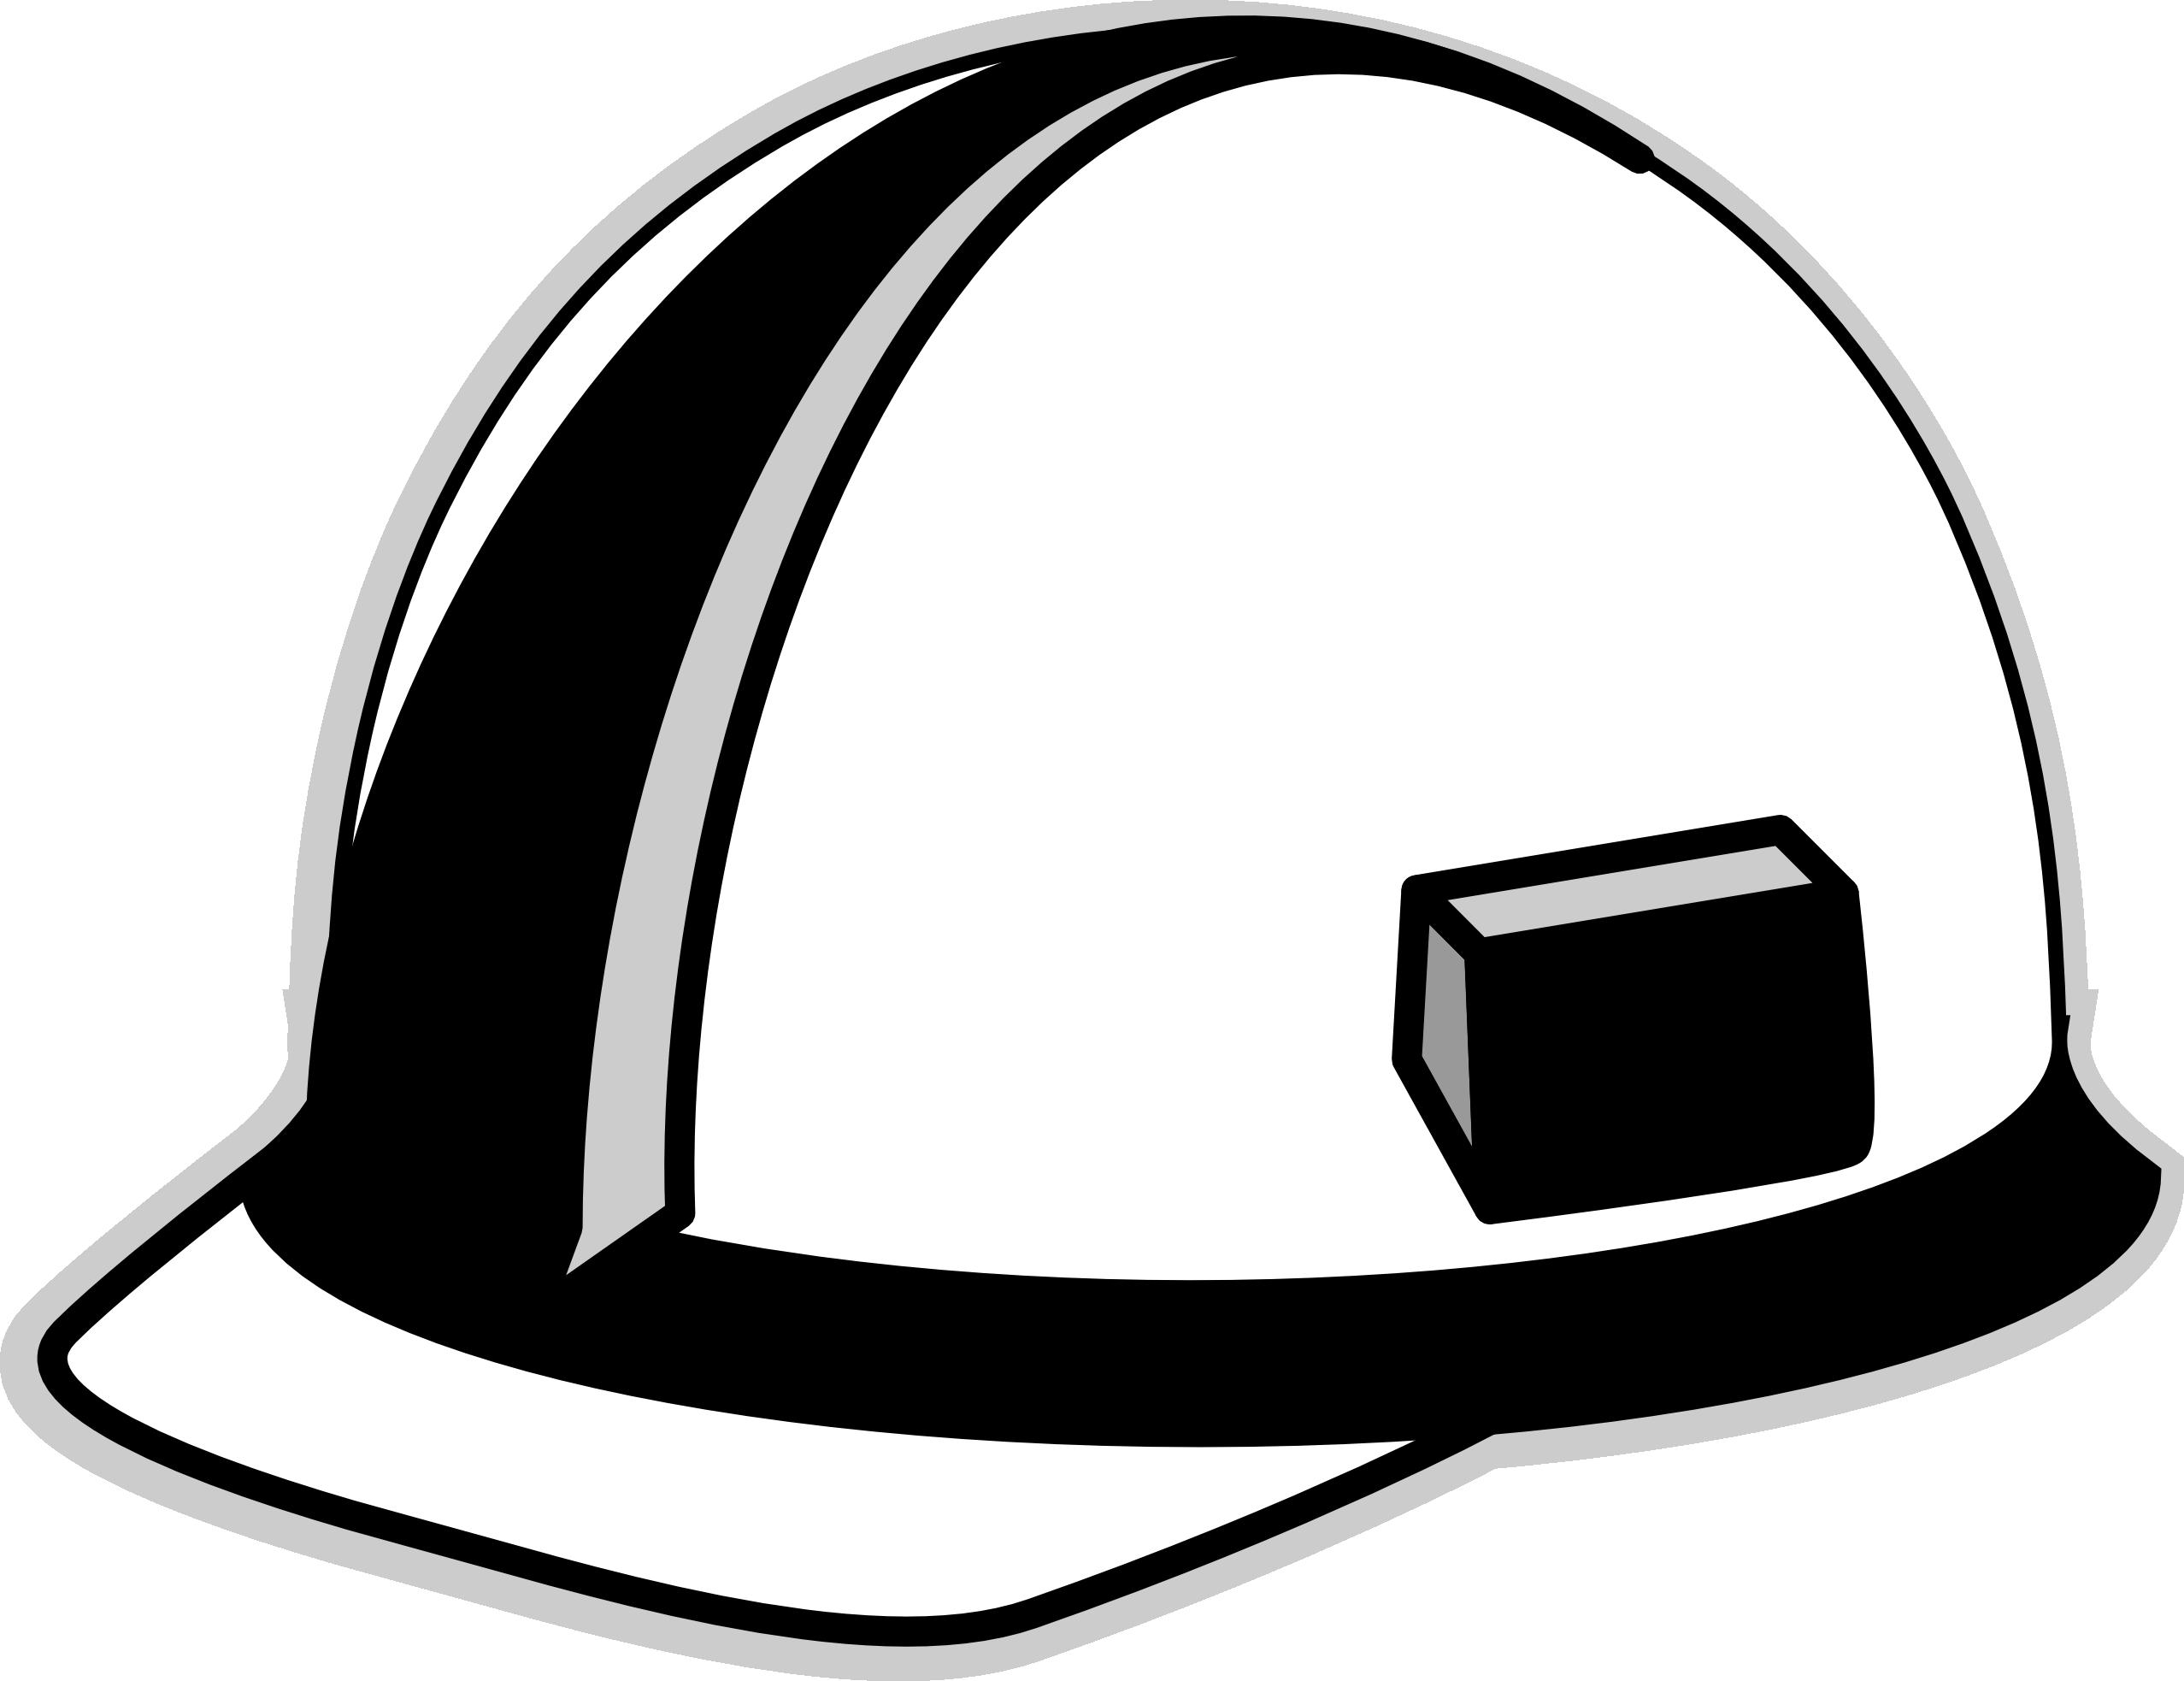 Hard hat art image. Engineering clipart hardhats